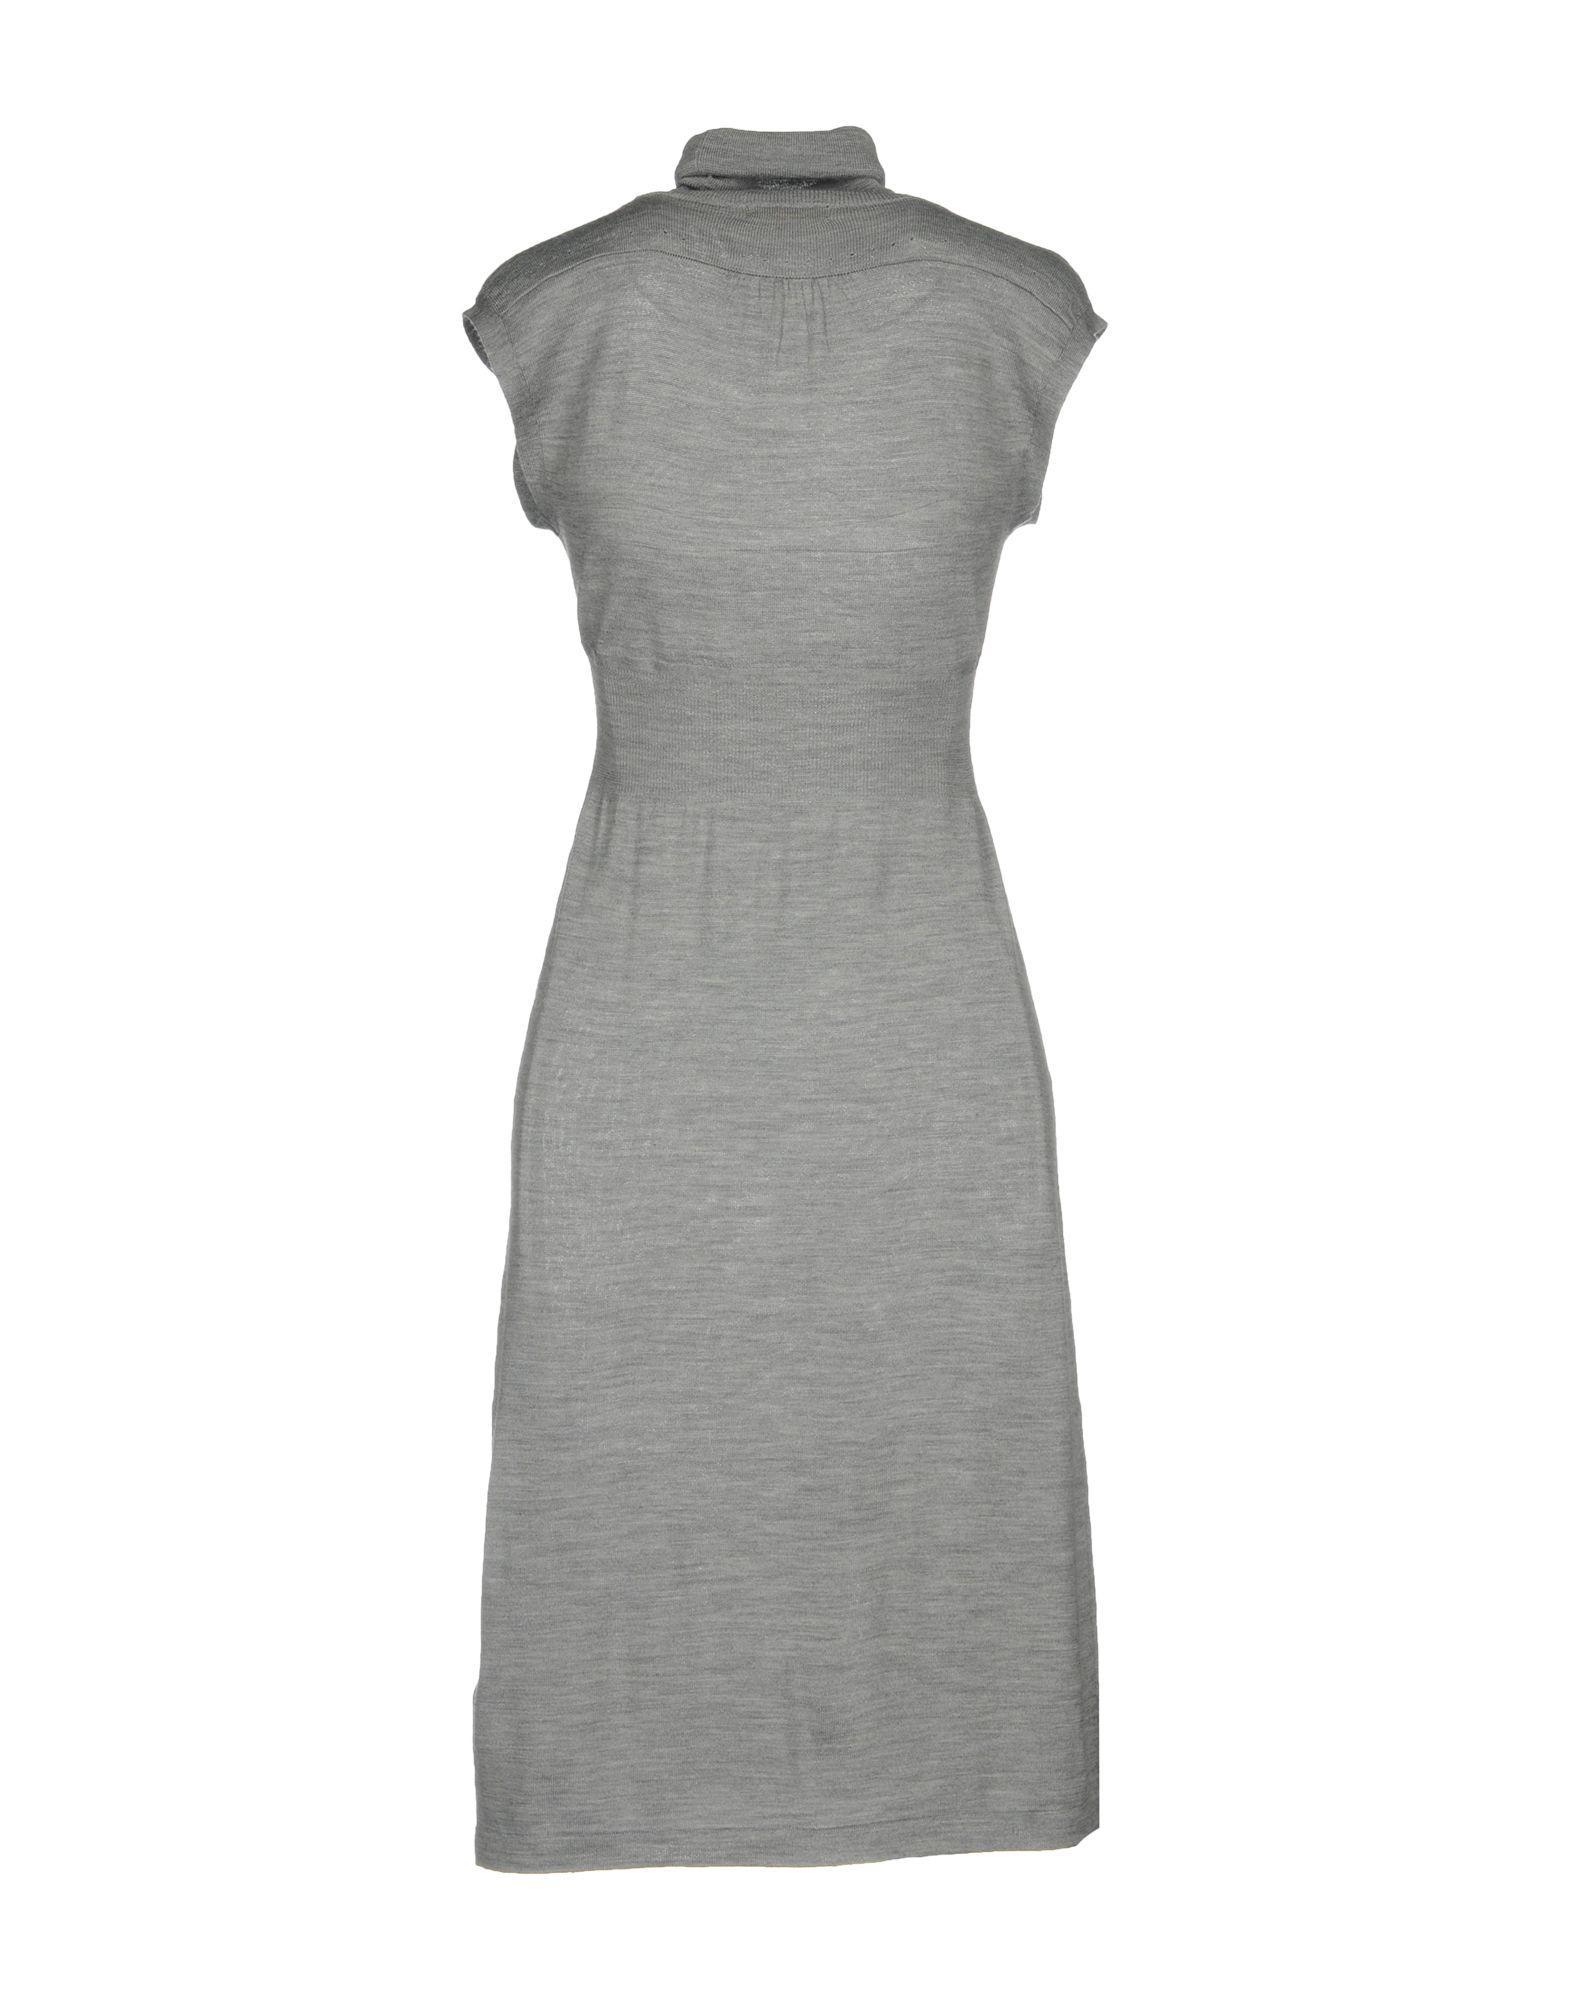 DRESSES - Short dresses Tooshie iImZgu